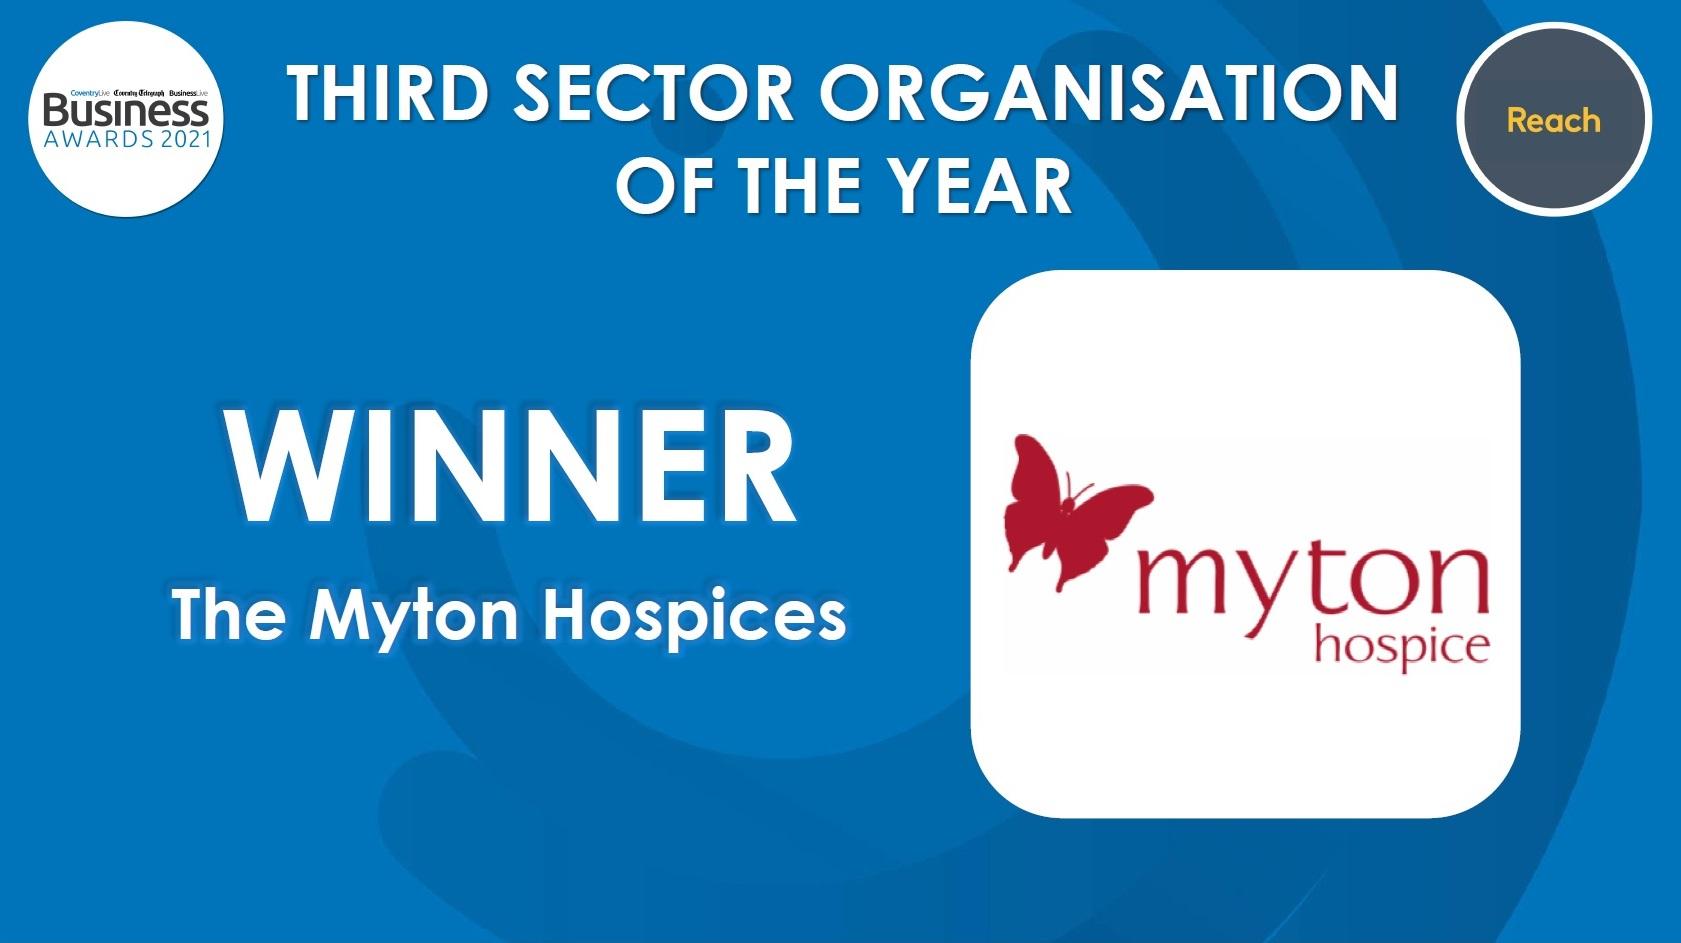 The Myton Hospices - Awards Winner